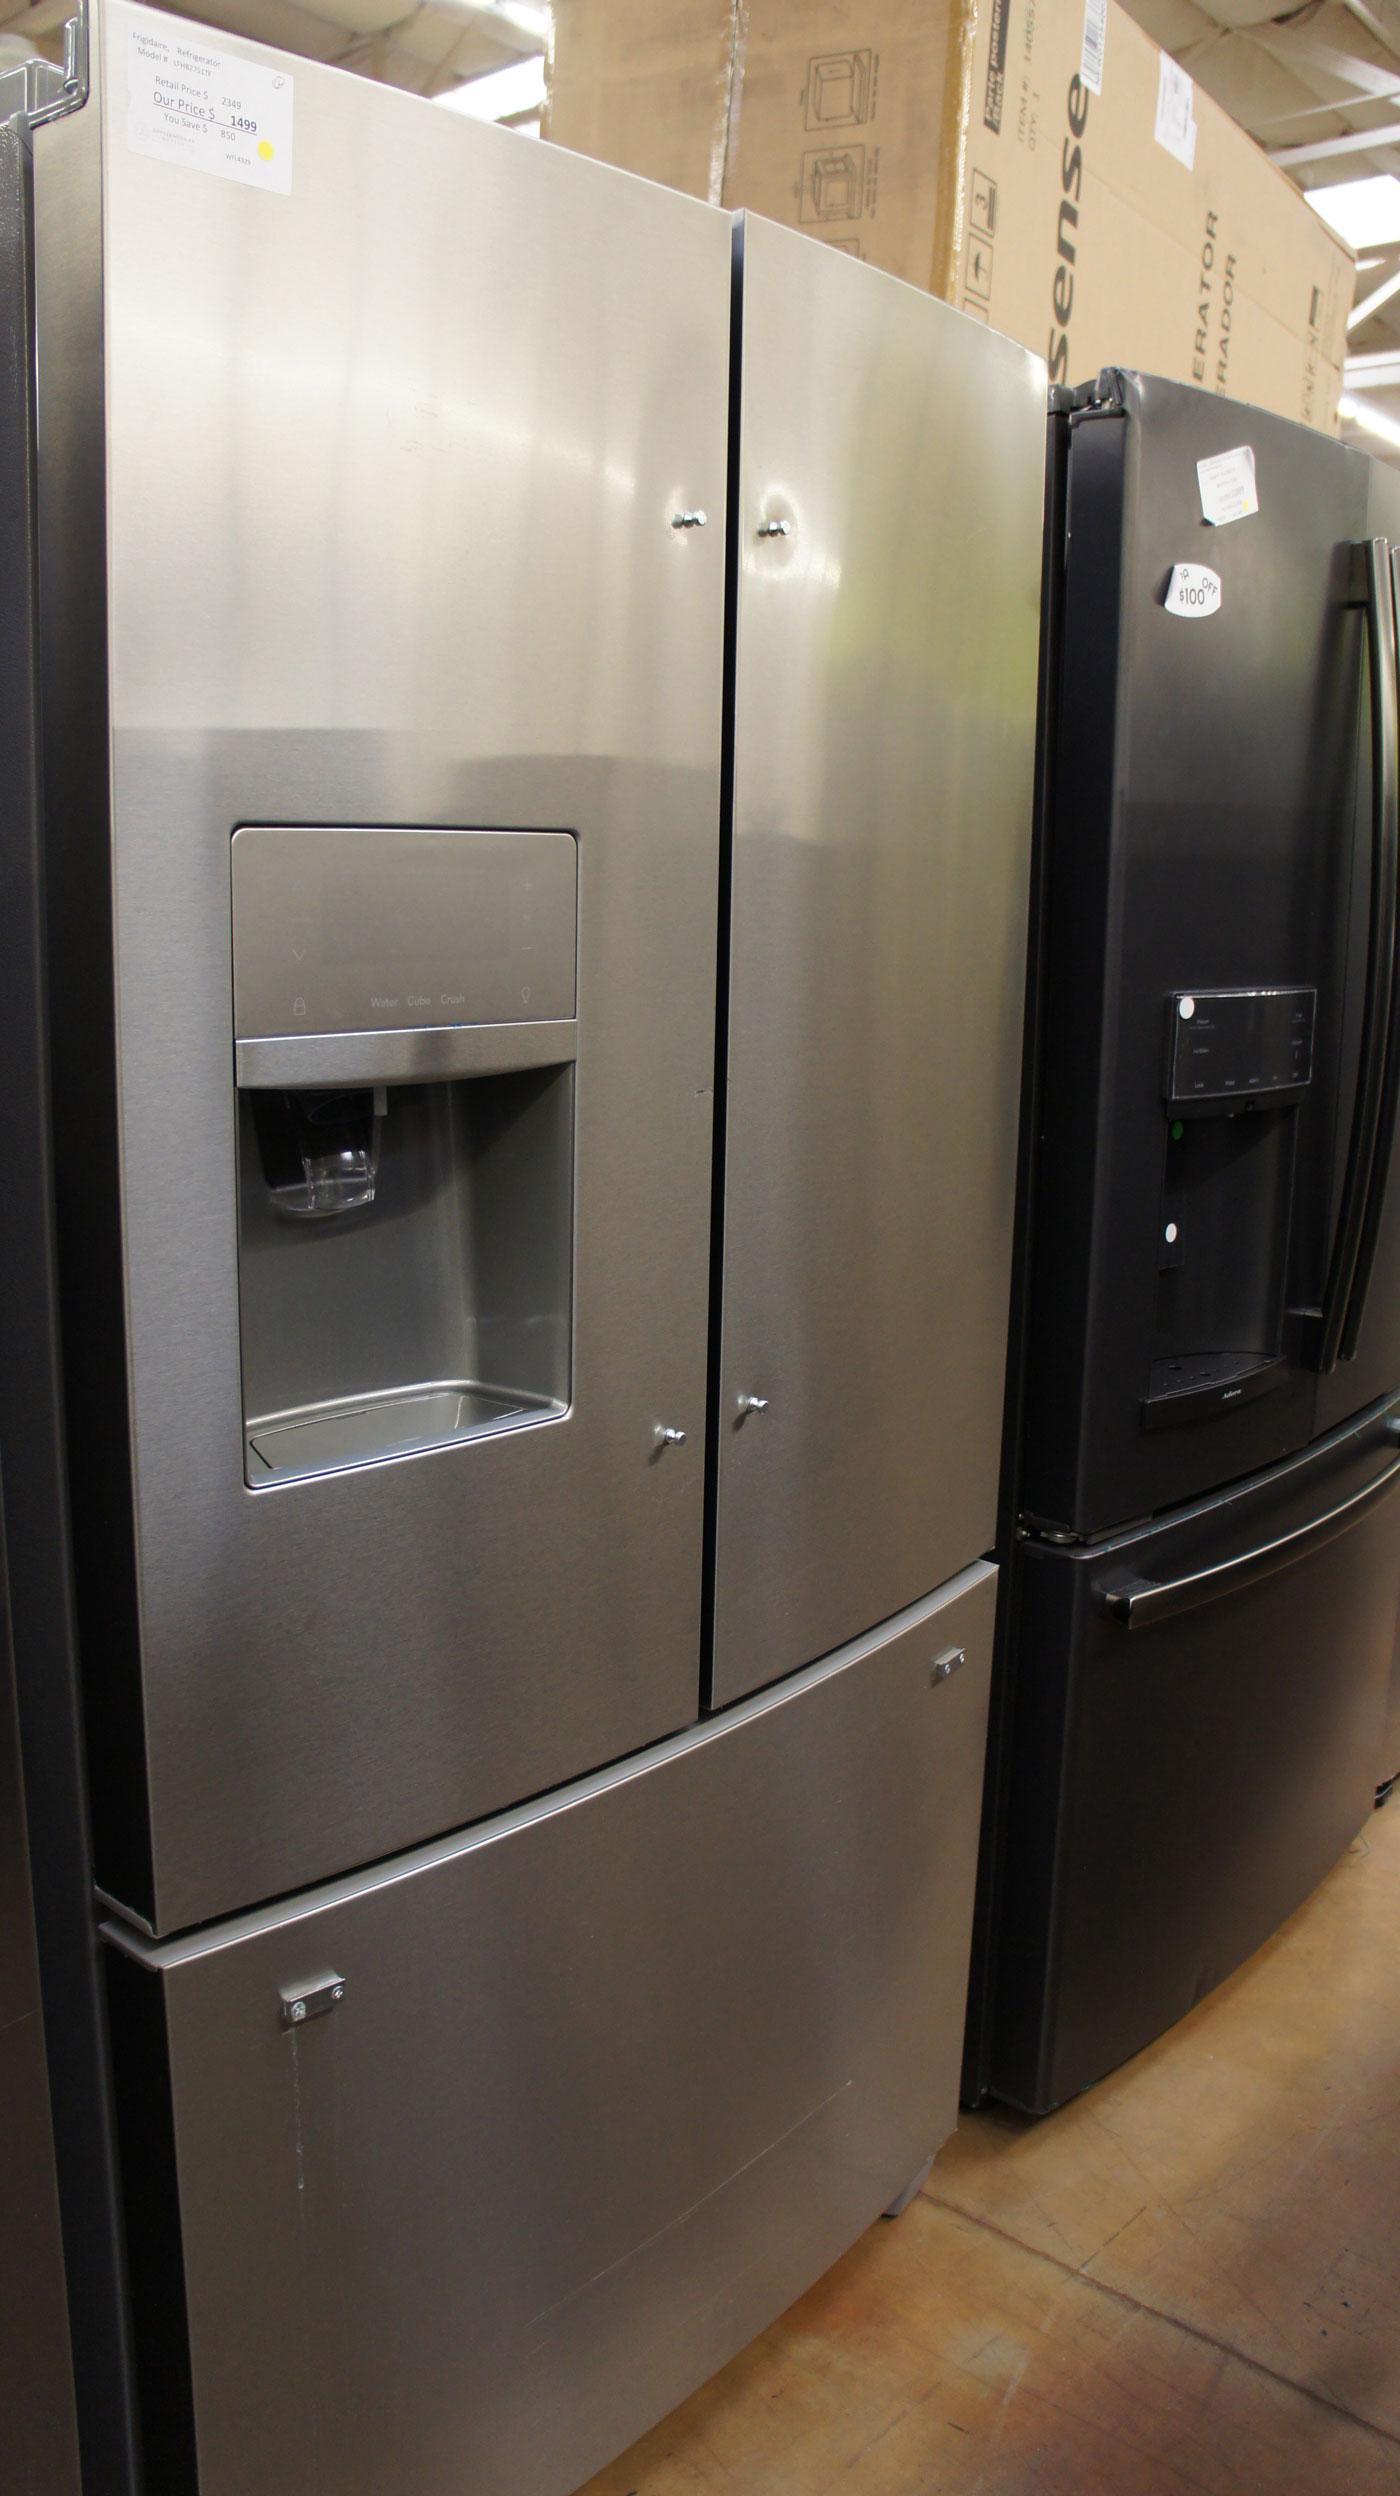 Frigidaire LFHB2751TF FrenchDoor Refrigerator